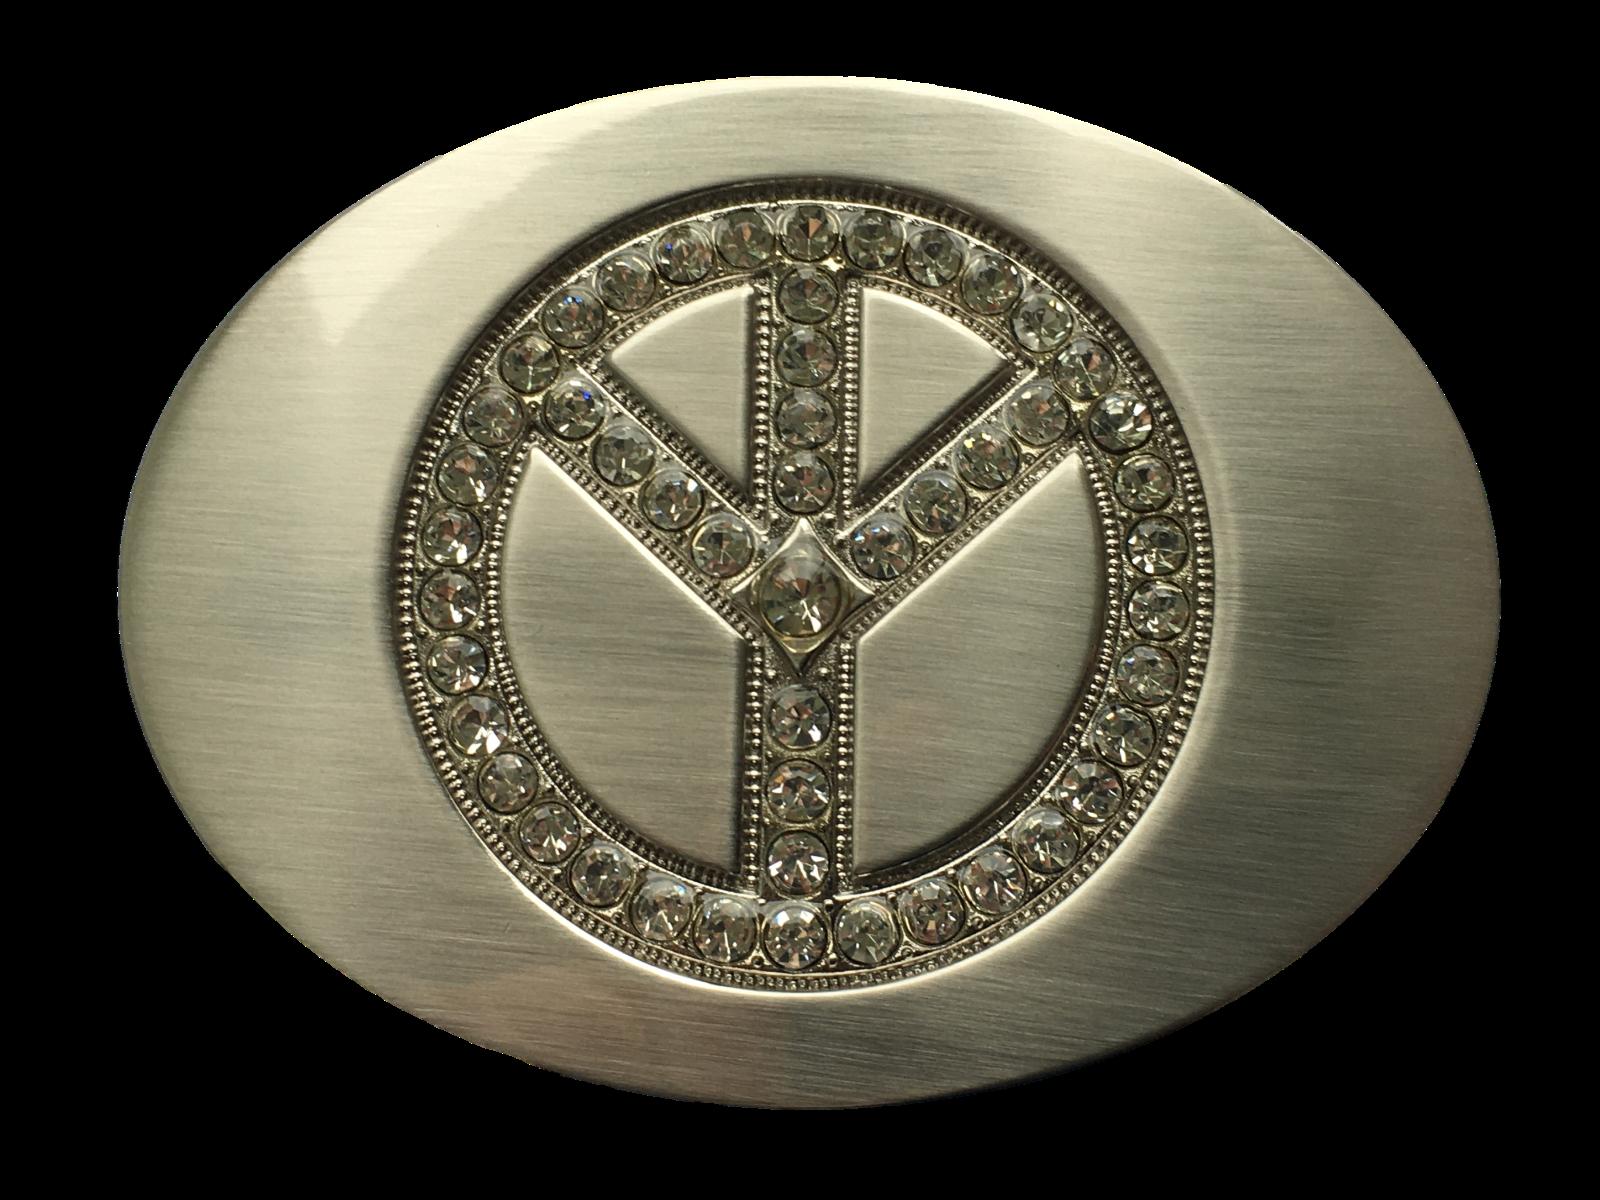 Belt Buckle Peace Symbol Silver with Diamante Inlay 40mm Biker Cowboy Western